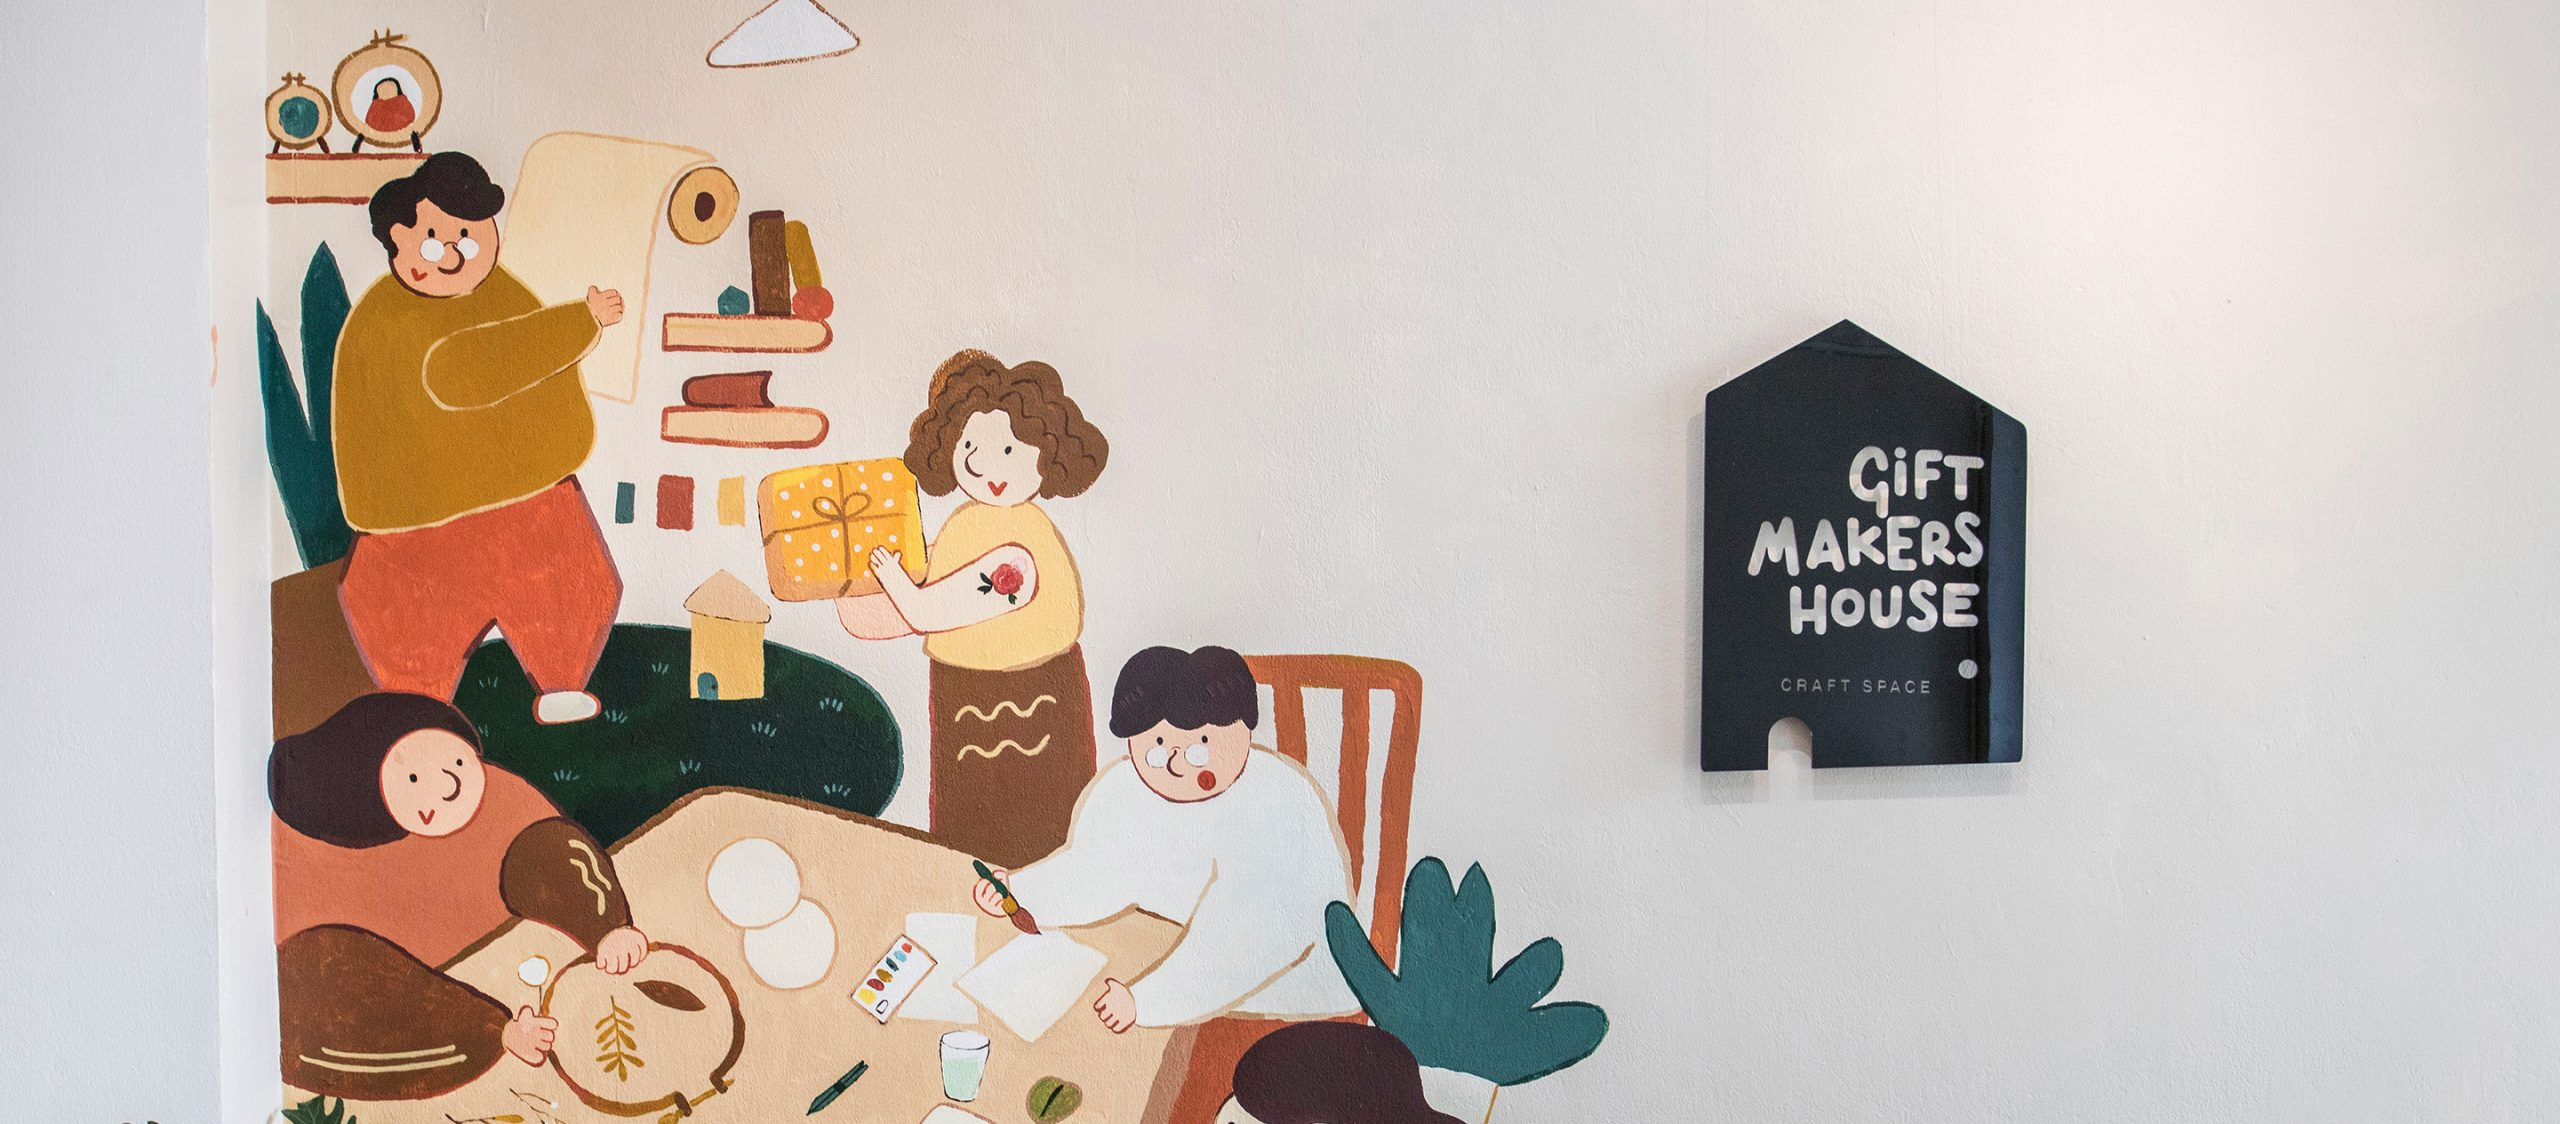 Gift Makers House : สตูดิโอคราฟต์ที่ชวนทุกคนทำของขวัญแทนใจด้วยมือตัวเอง